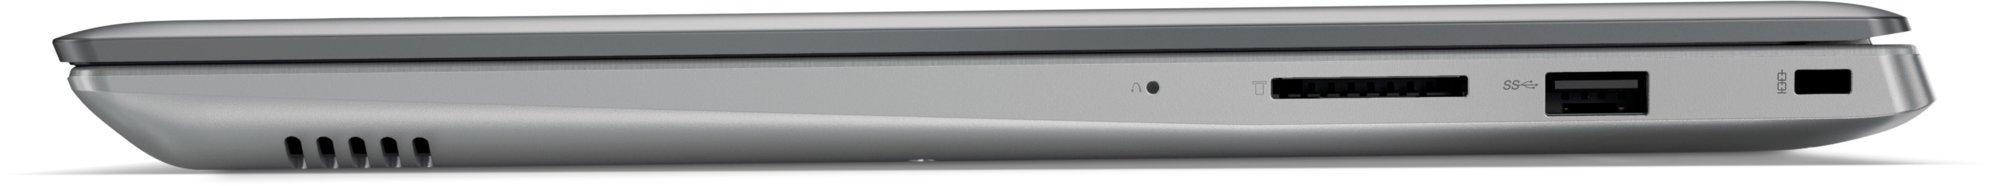 Lenovo IdeaPad 320-14IAP